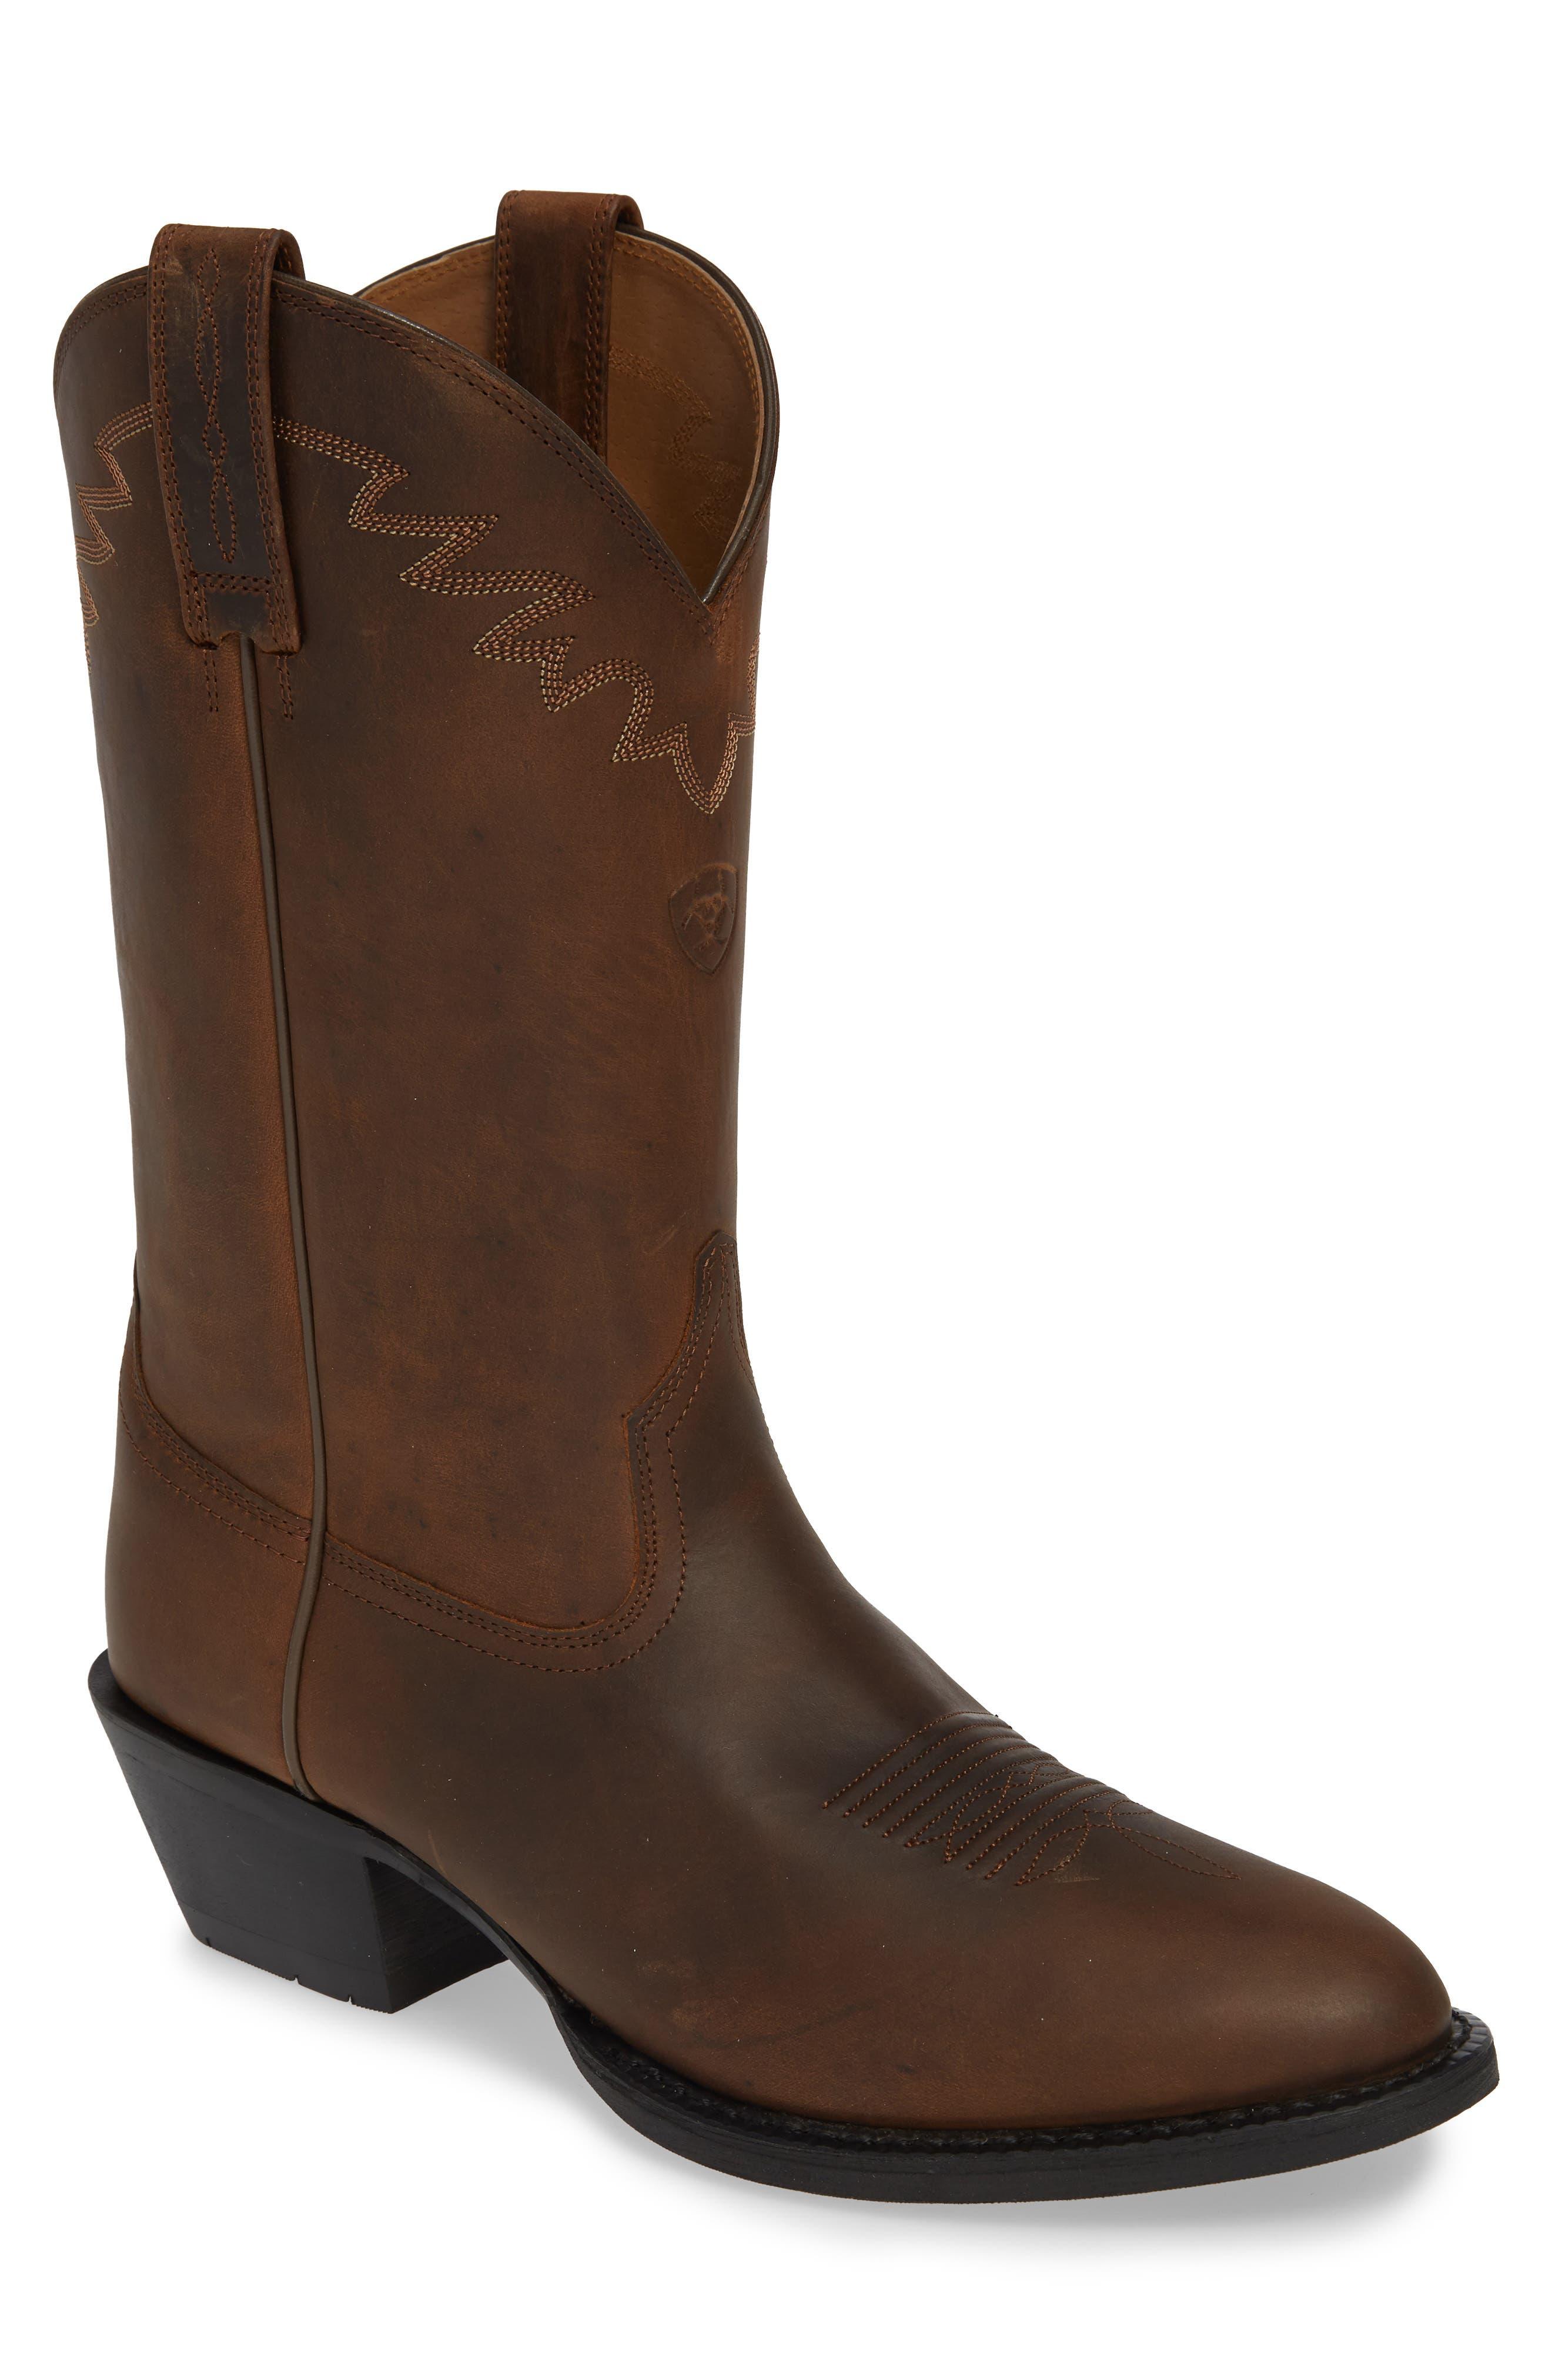 Ariat Sedona Cowboy Boot, Brown